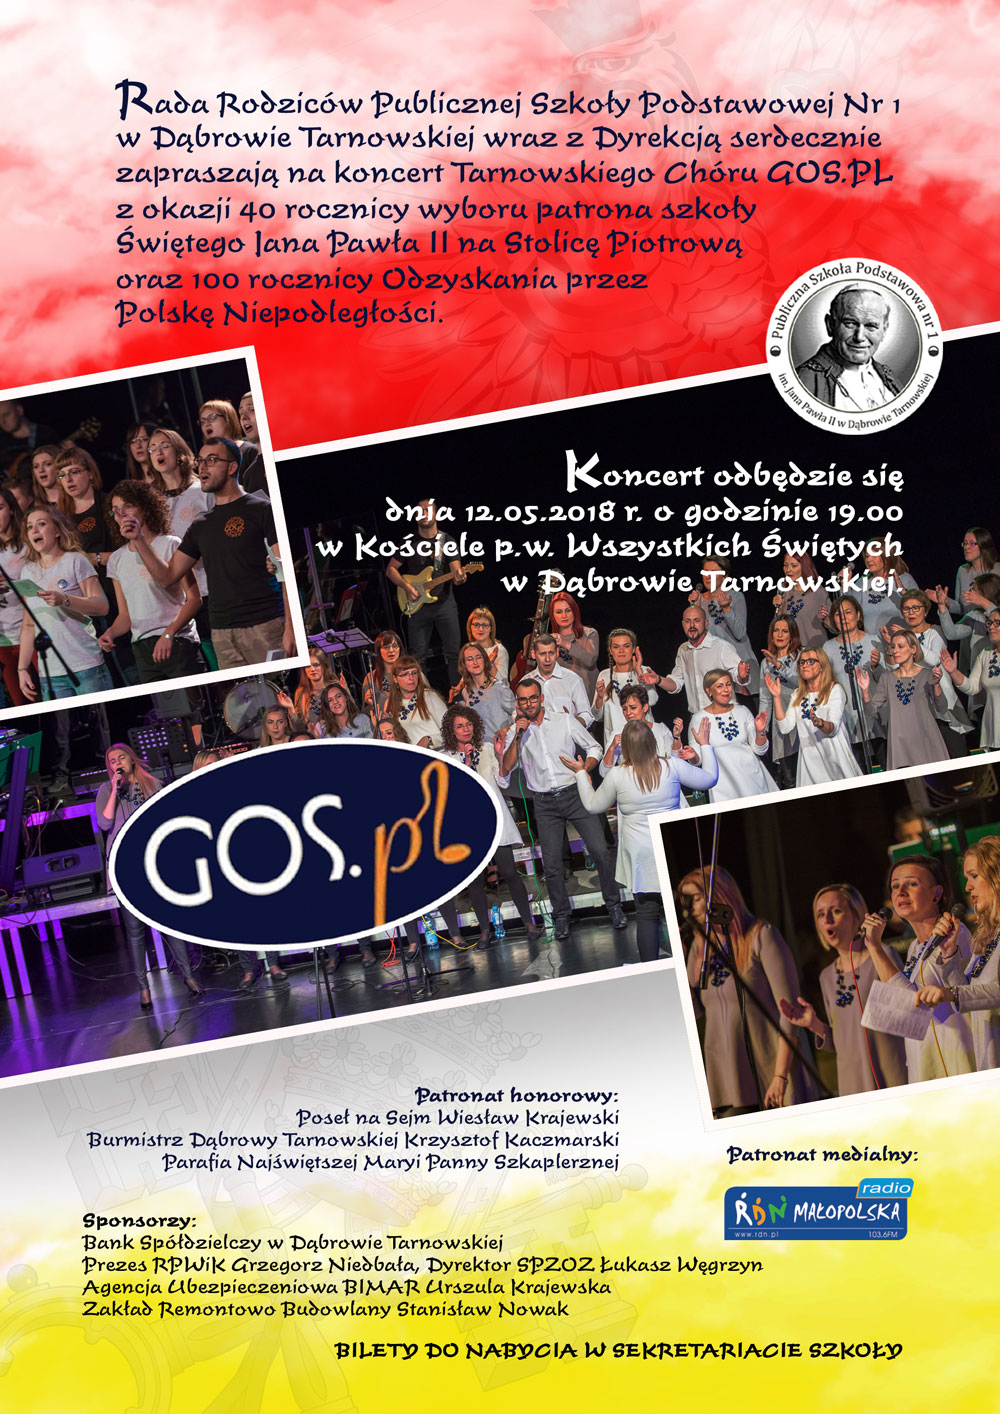 Koncert GOS PL 12maja2018 Dąbrowa Tarnowska Zapraszamy na koncert Tarnowskiego Chóru GOS.PL   12 maja br.